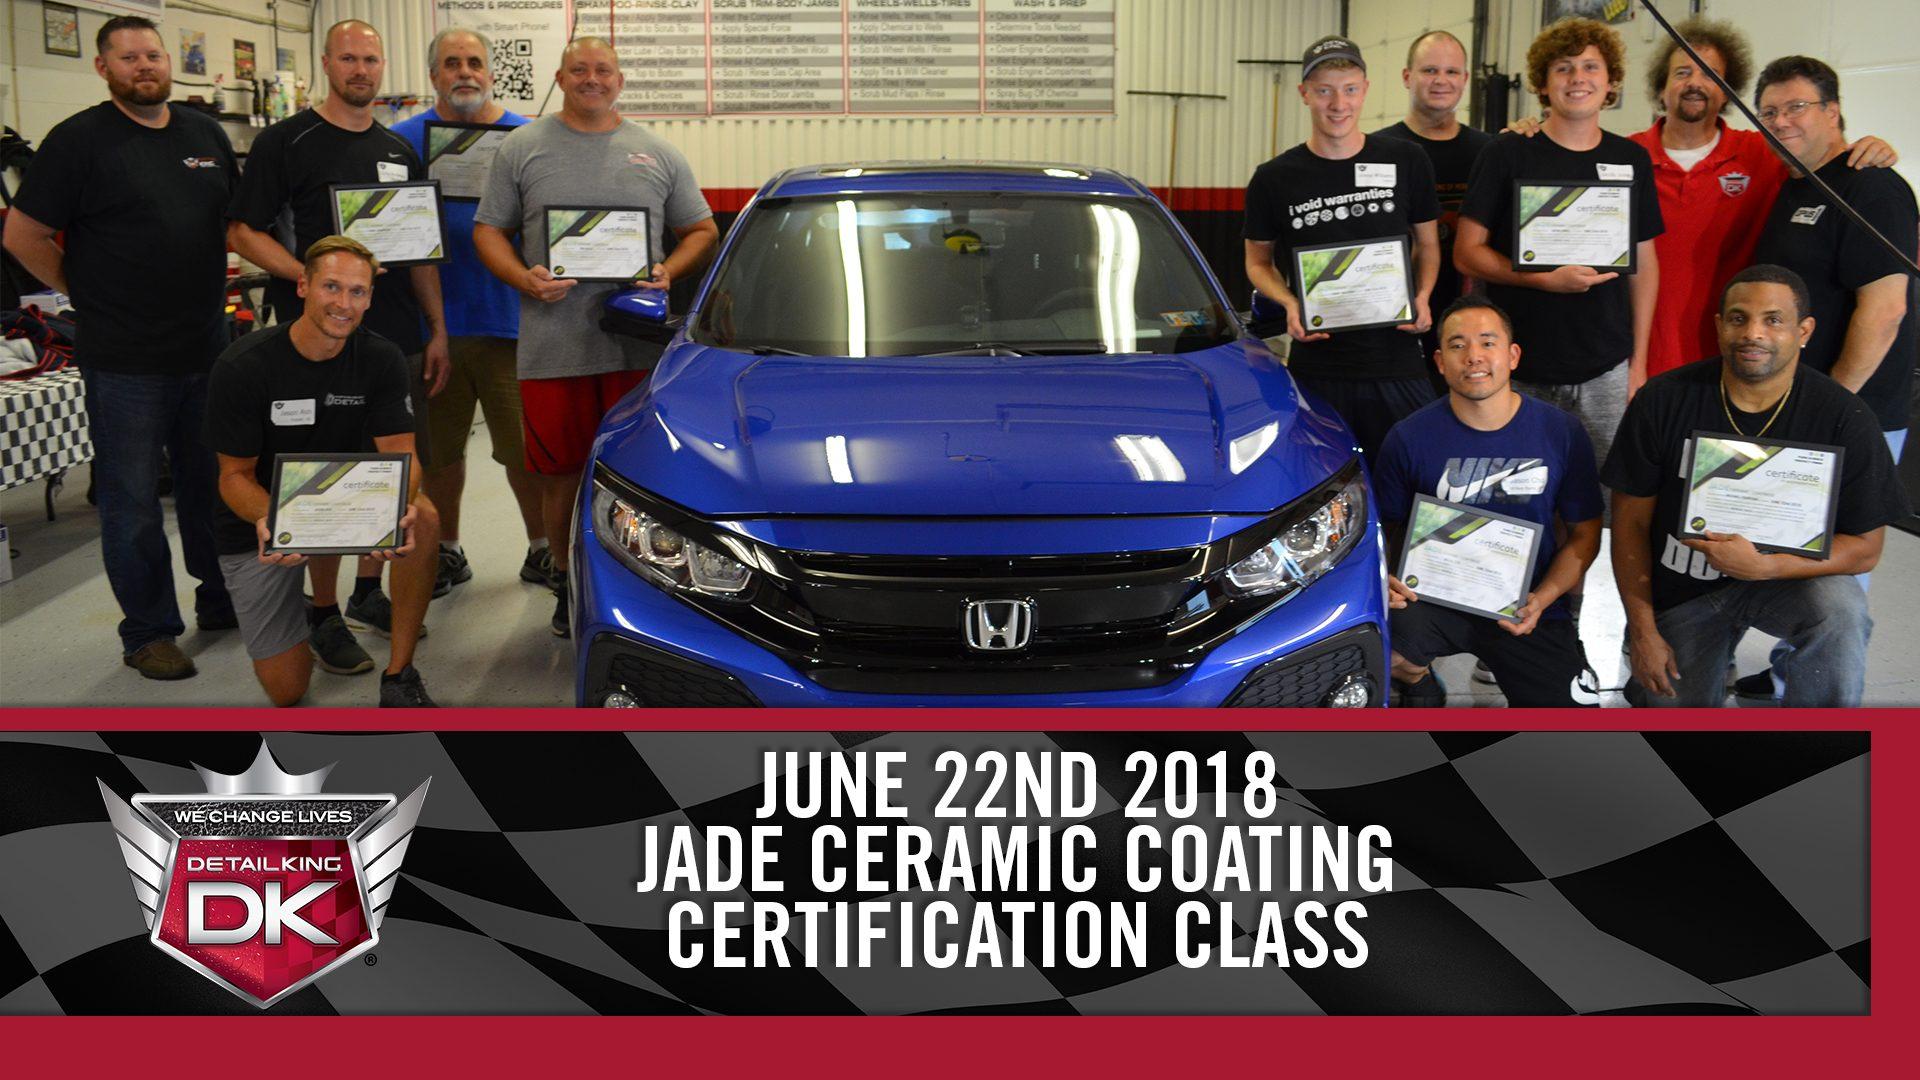 June 22nd 2018 – Jade Ceramic Coating Certification Class